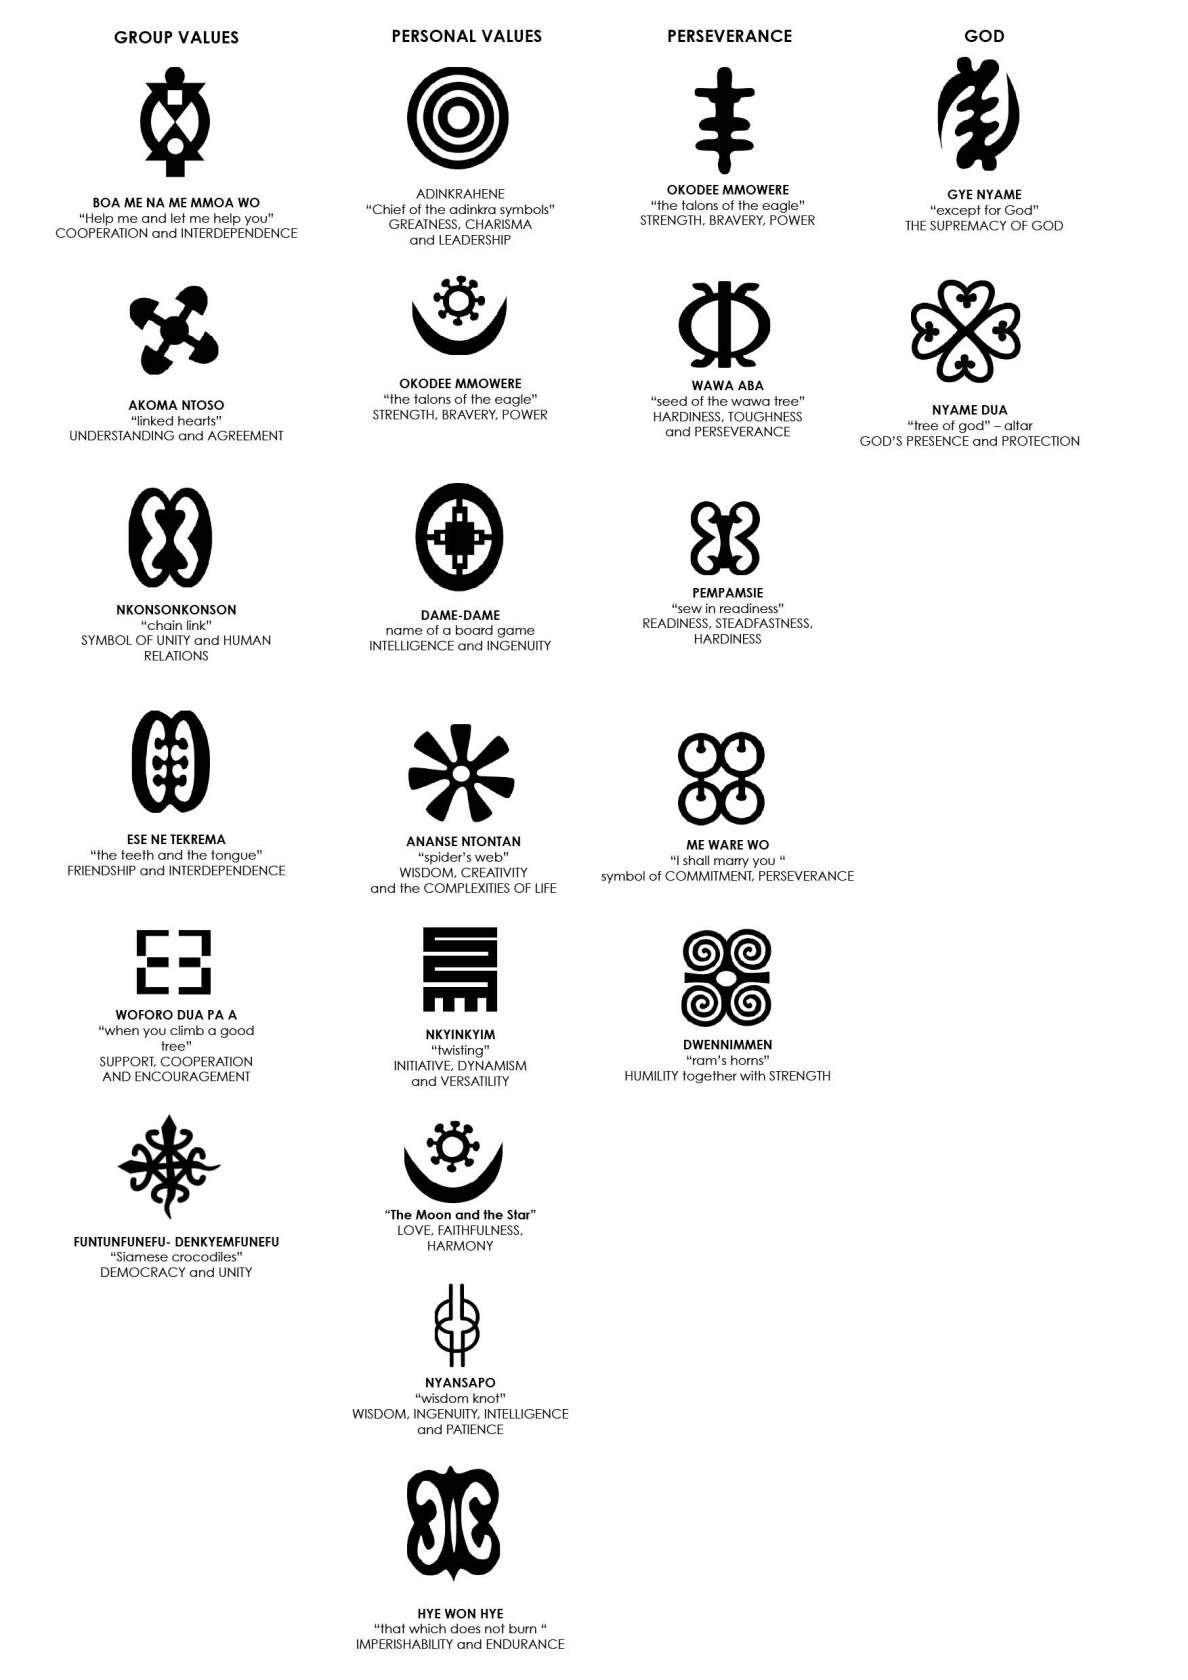 Adinkra symbols adinkra symbols symbols and tattoo adinkra symbols biocorpaavc